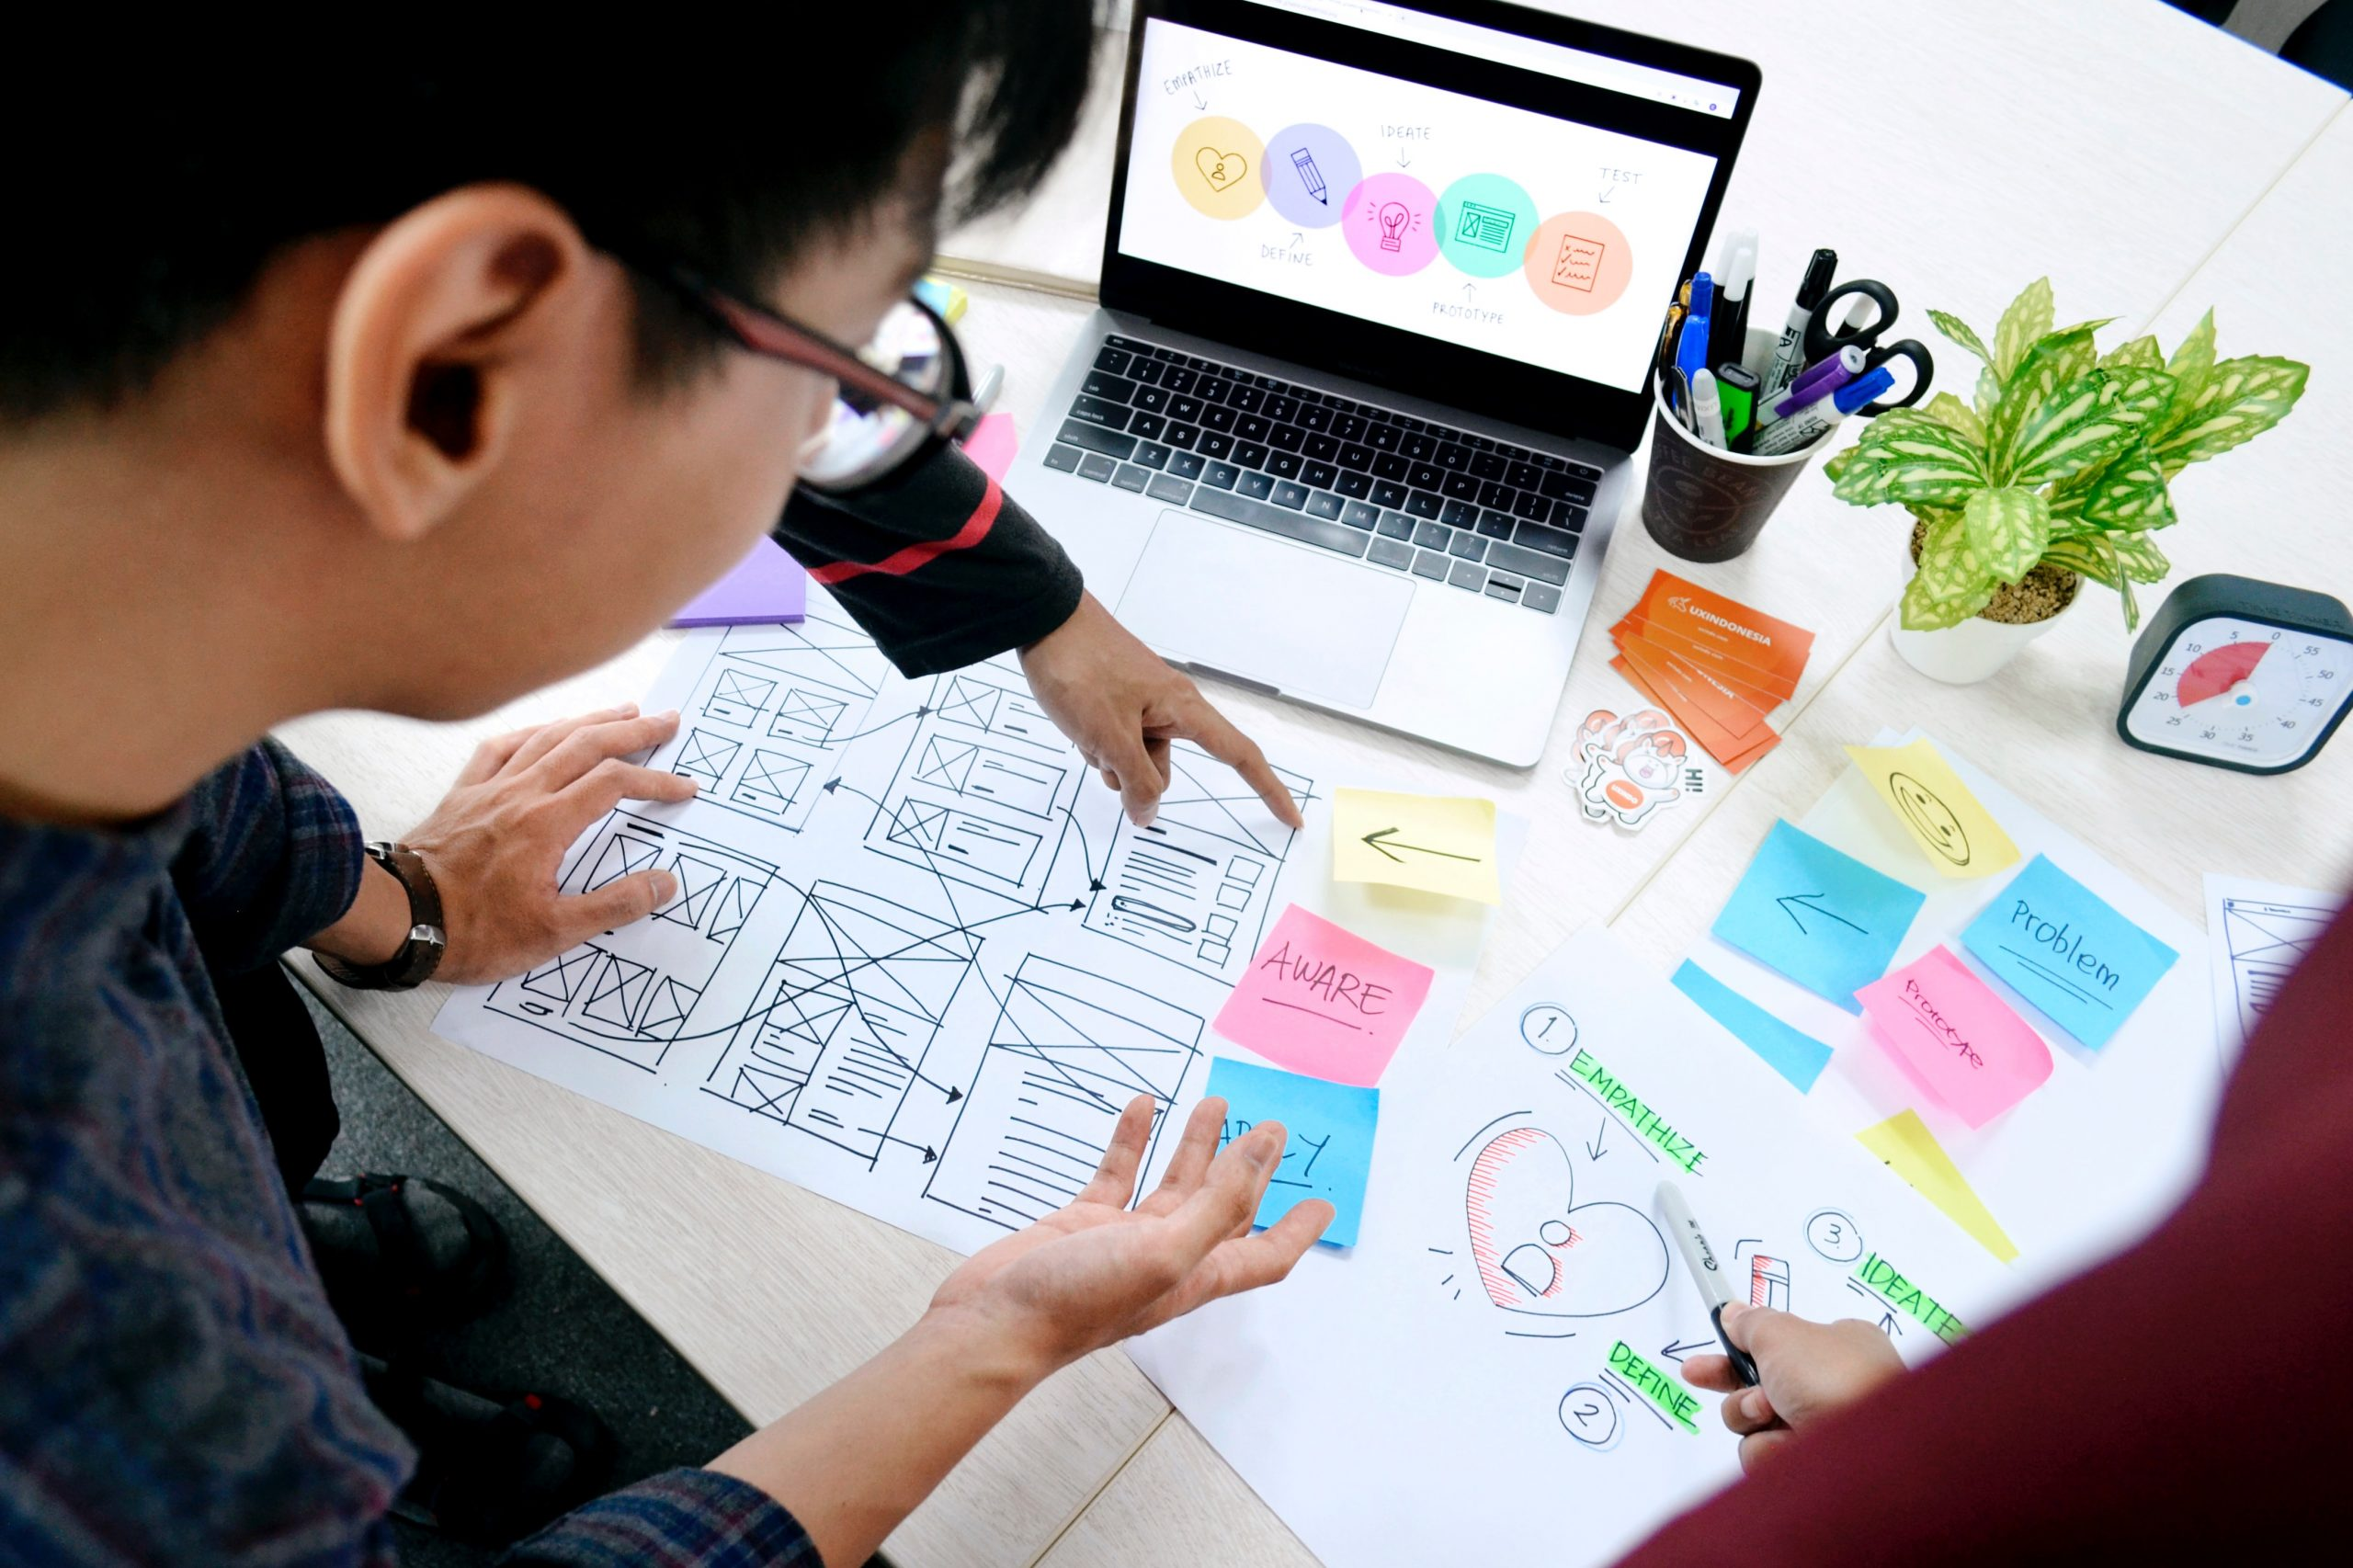 6 Tips for hiring a web designer